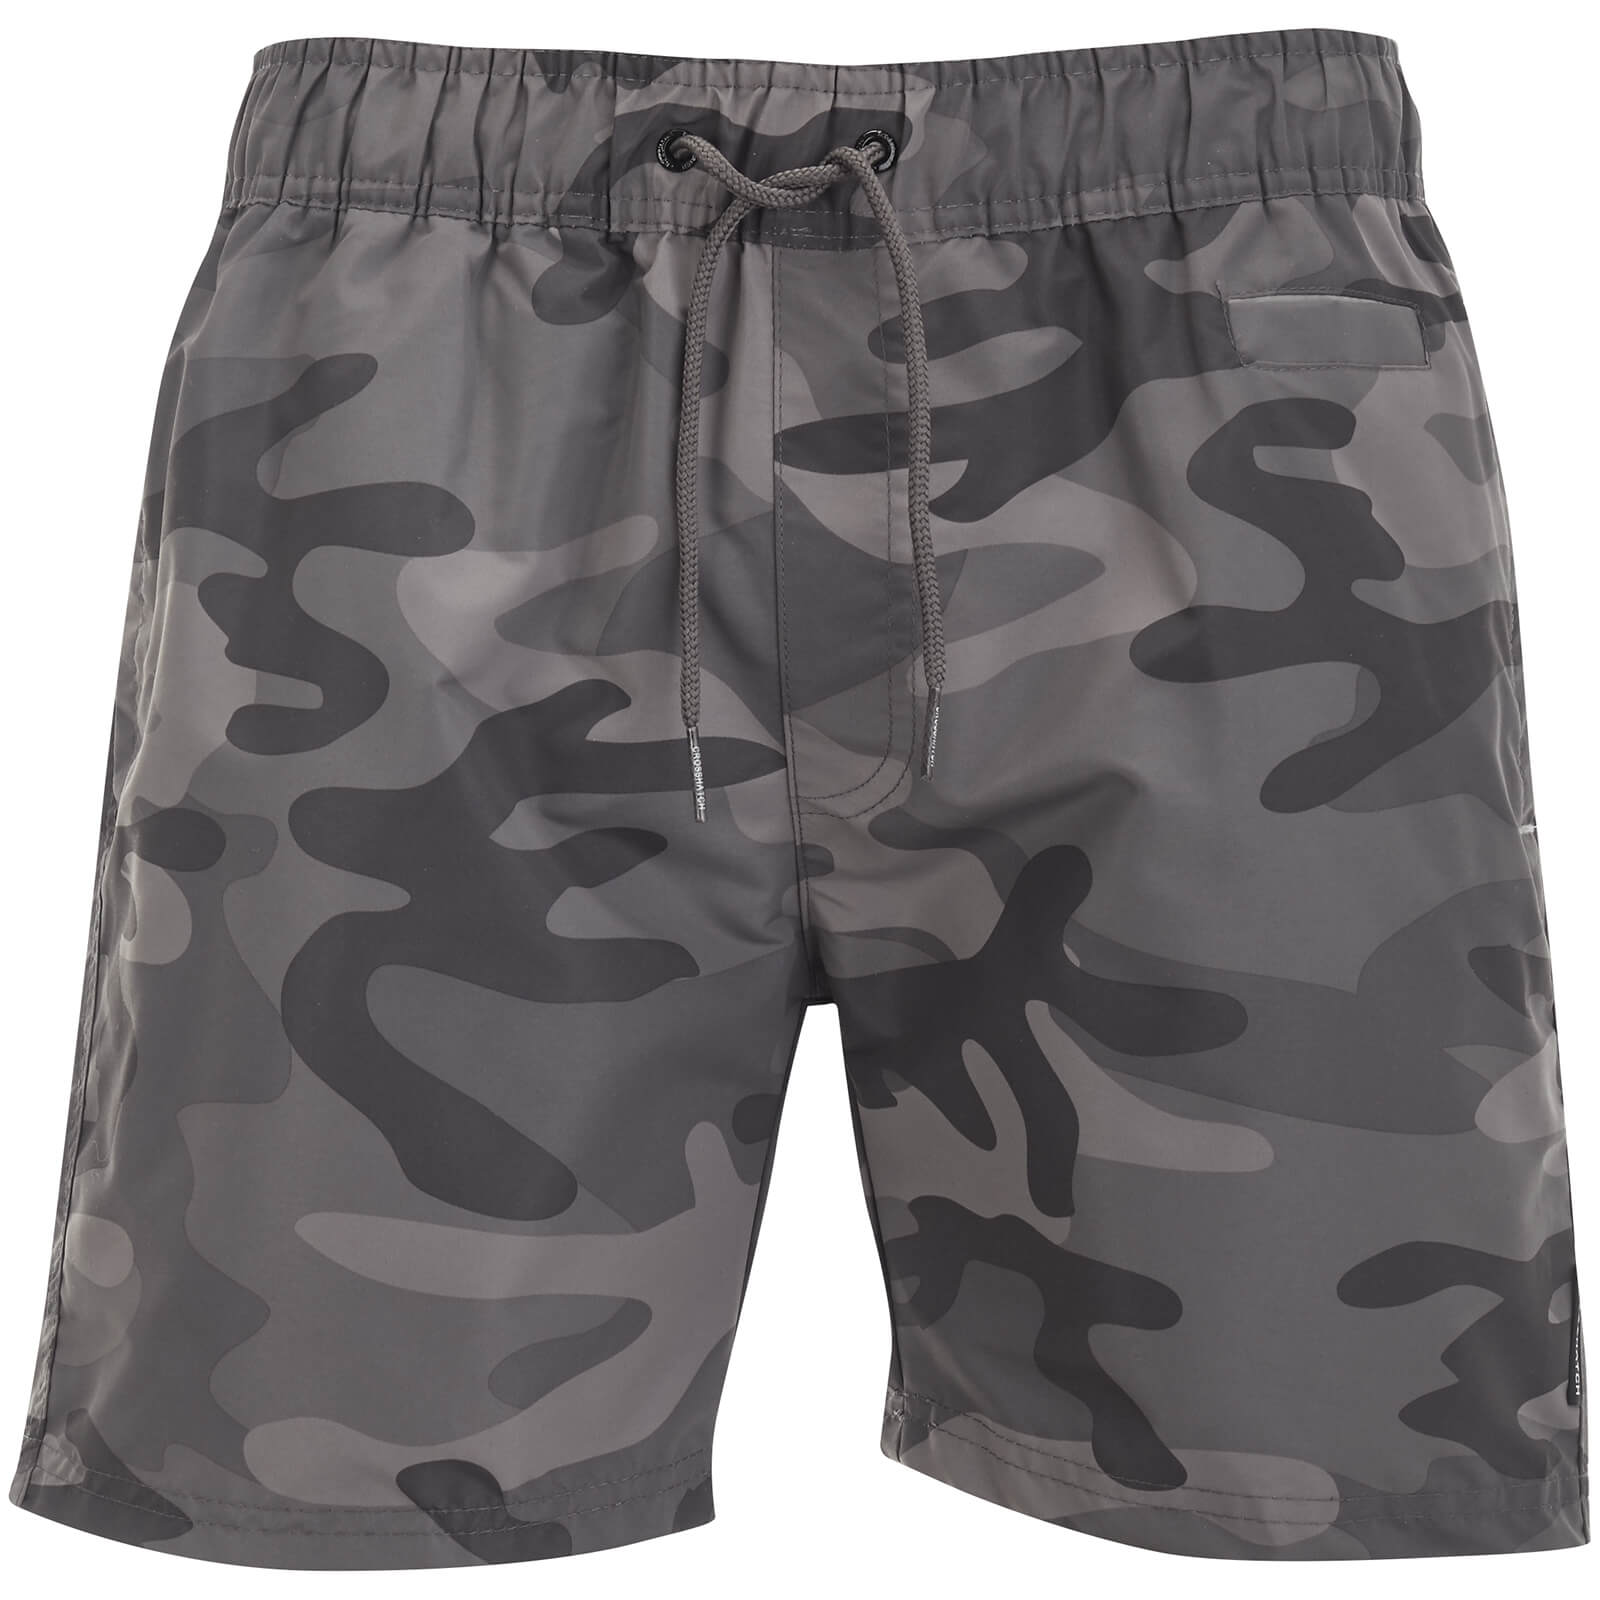 099ff4bf2f Crosshatch Men's Camo Swim Shorts - Charcoal Camo Mens Underwear   Zavvi